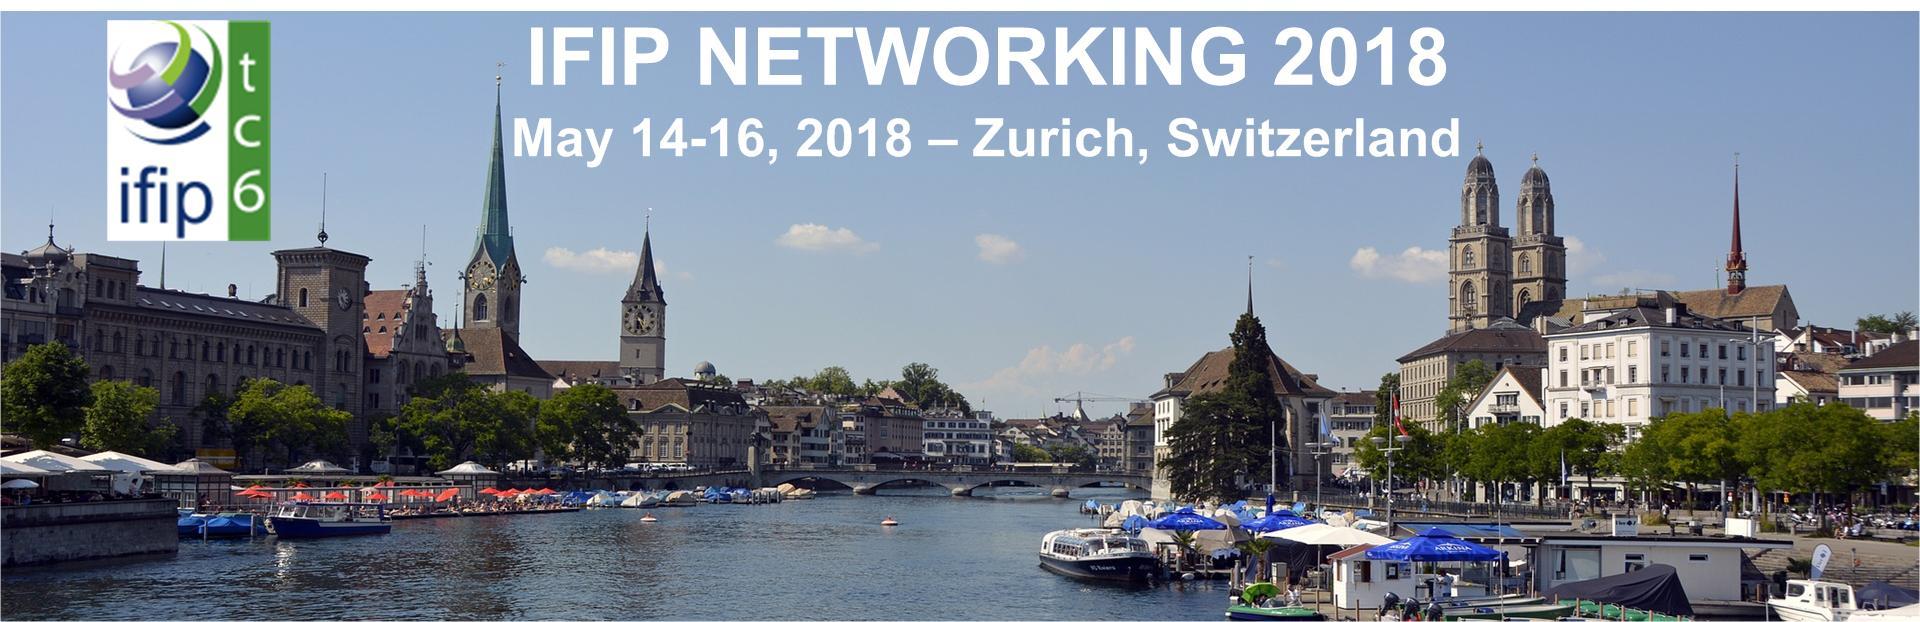 IFIP Networking 2018